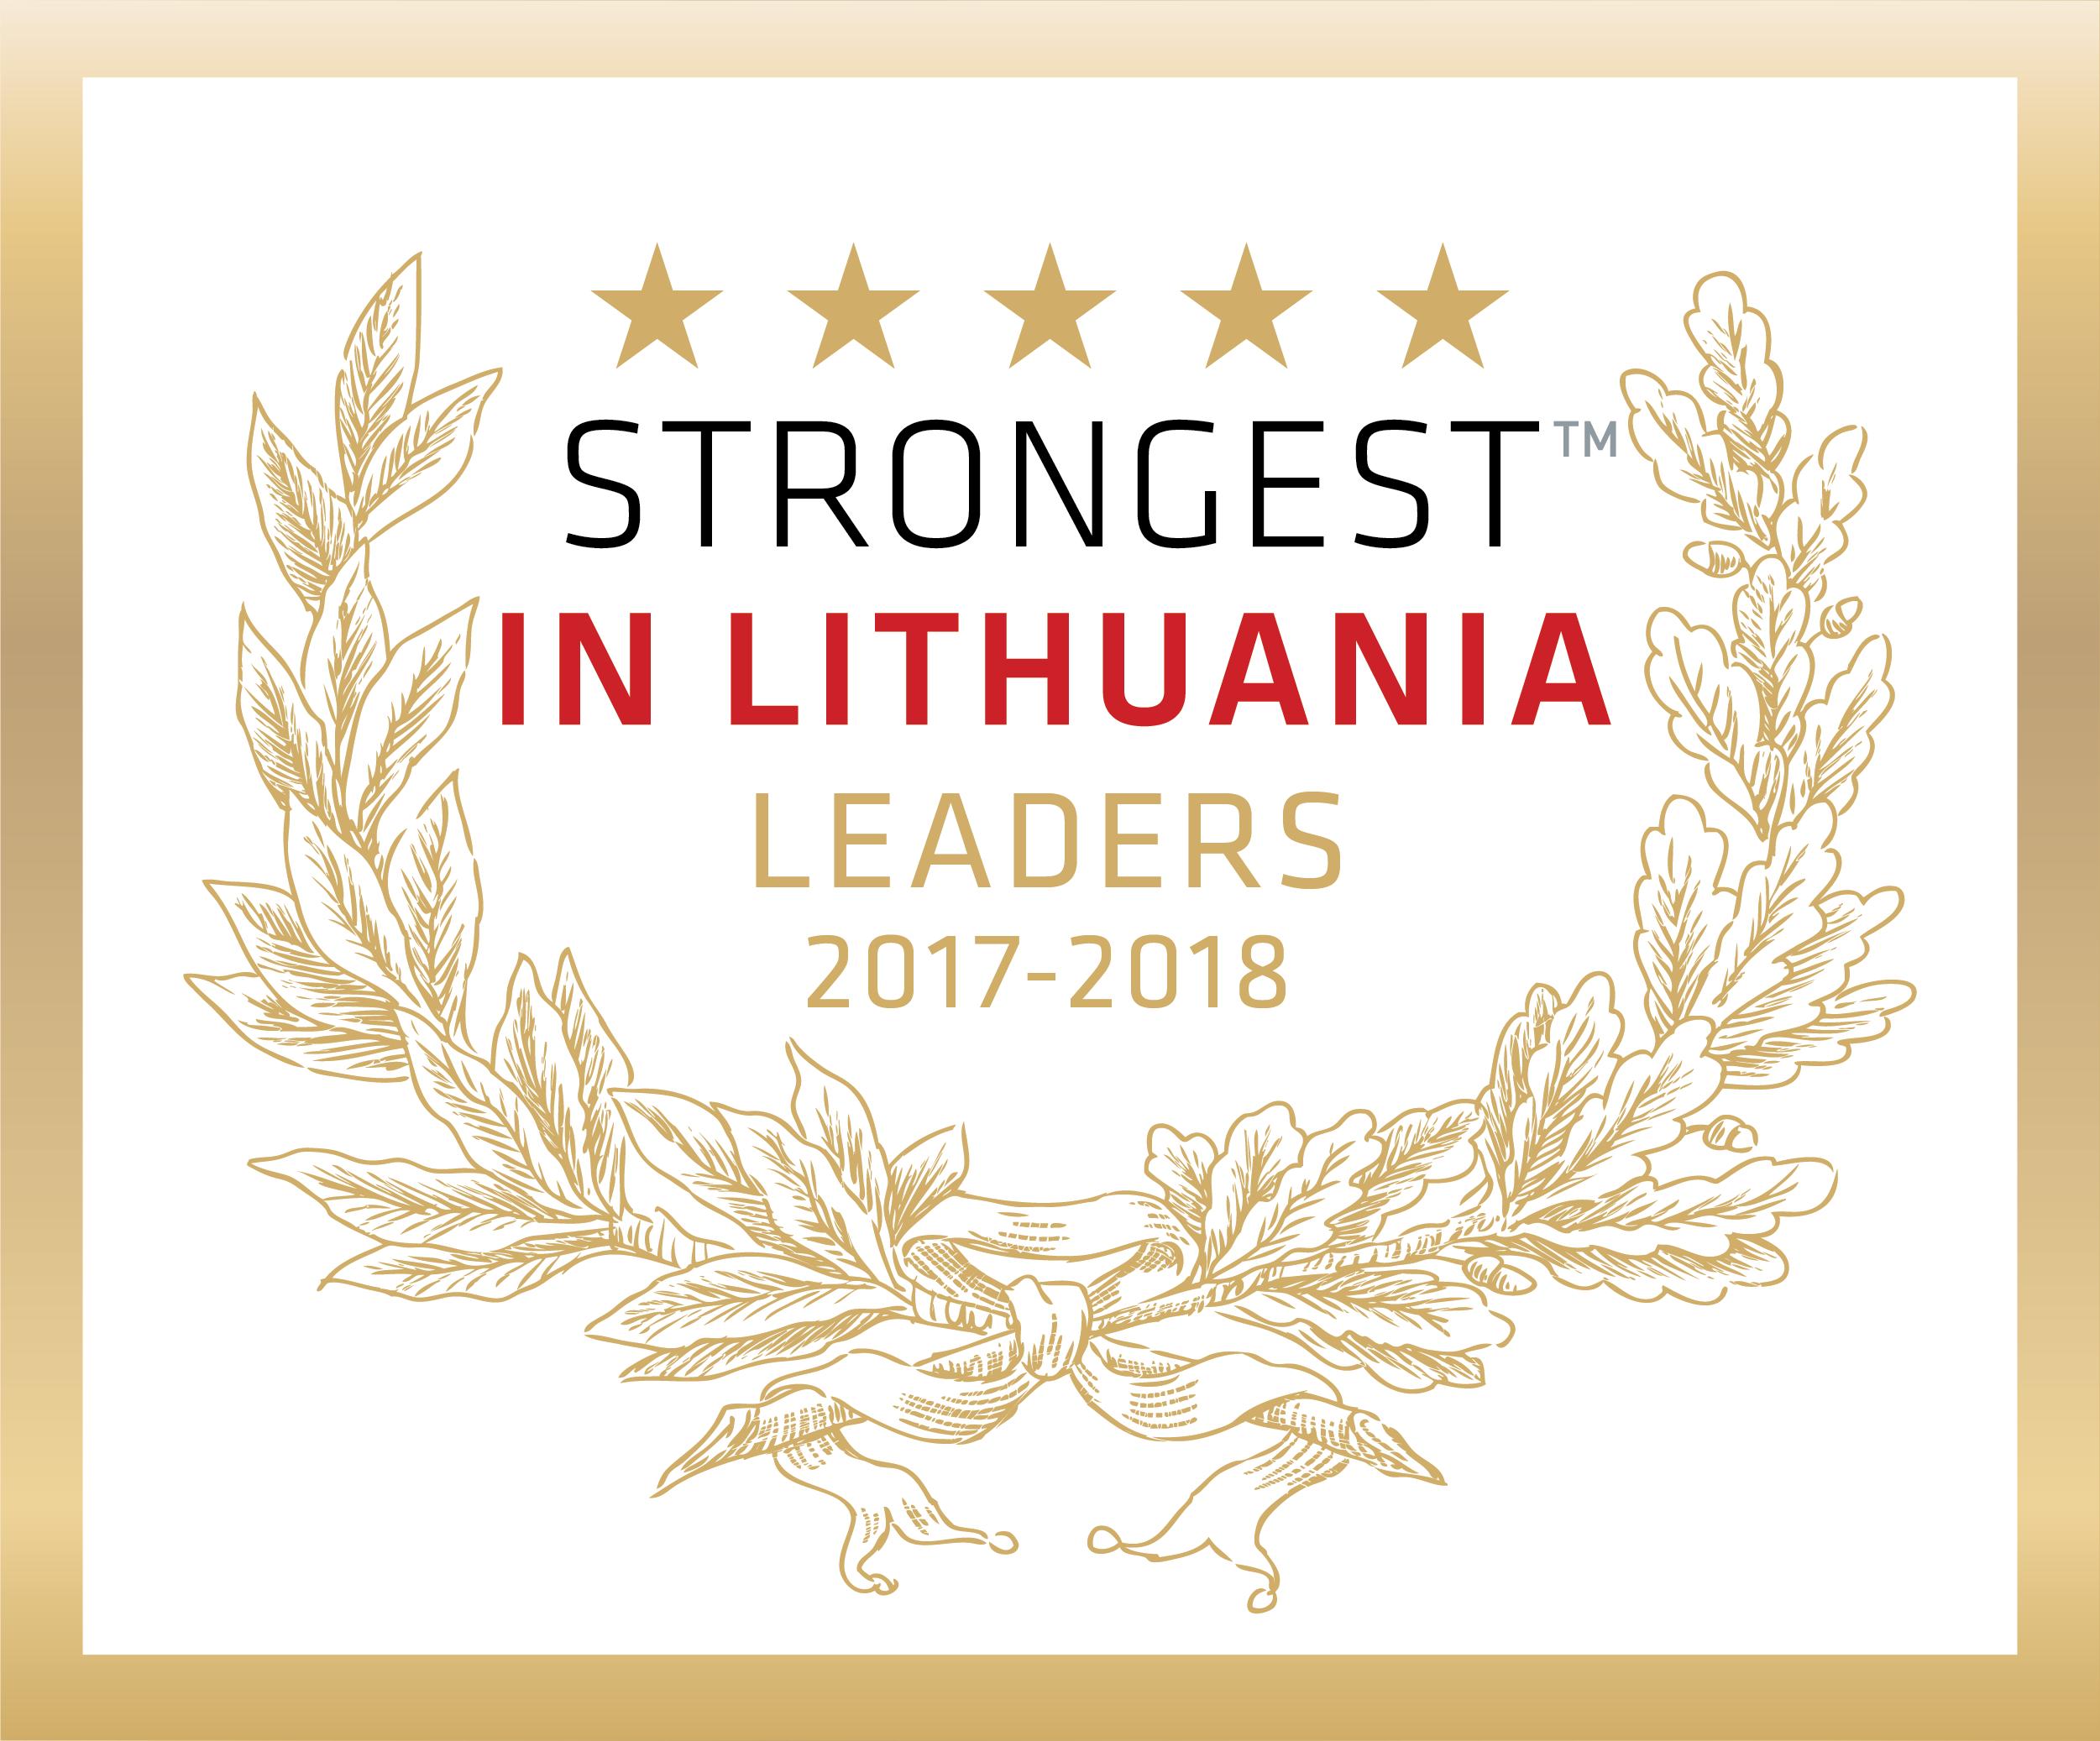 Stipriausi Lietuvoje 2012-2018